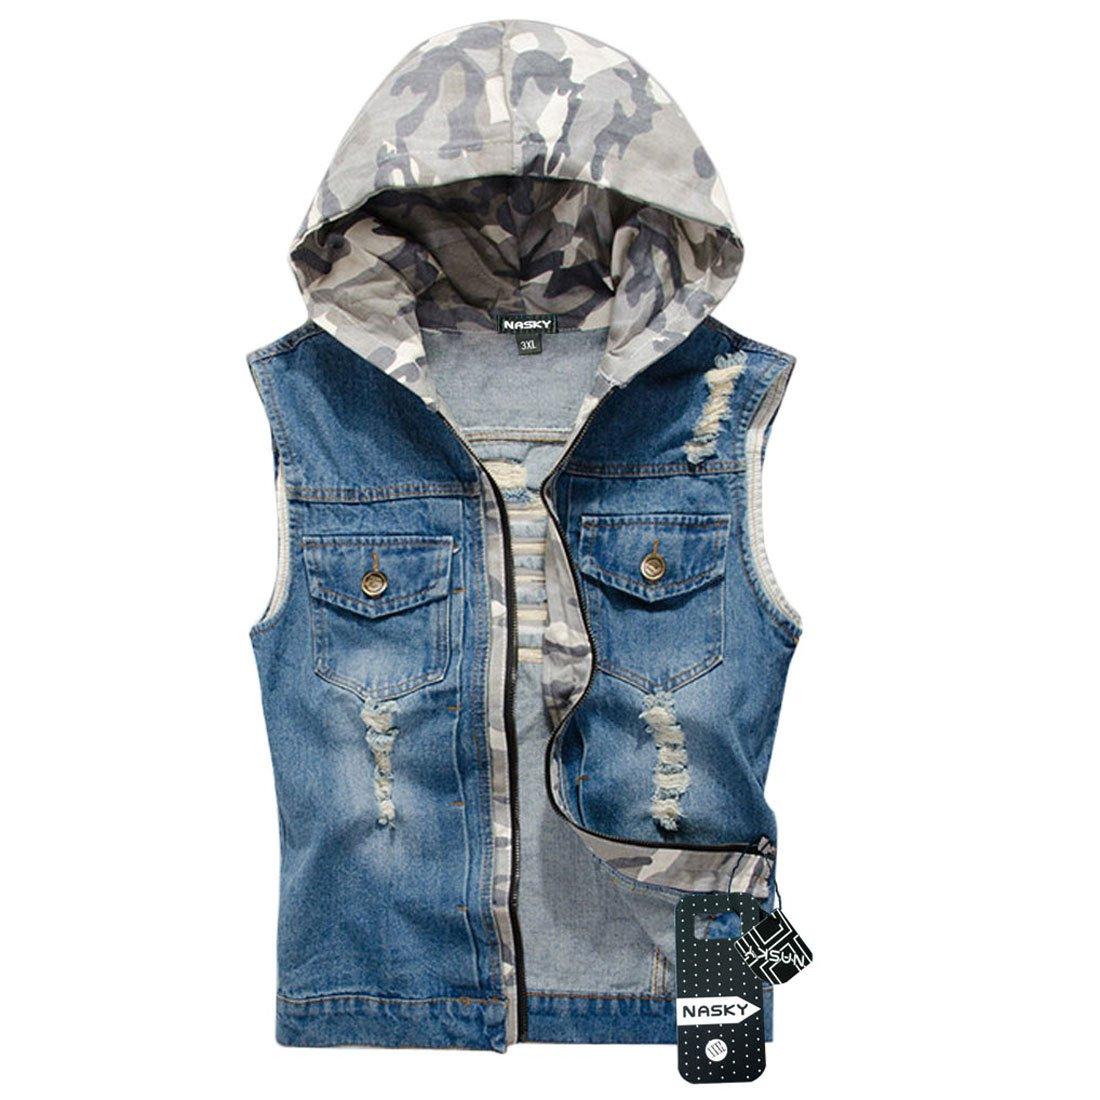 NASKY Men's Retro Ripped Jeans Denim Jacket Vest Hooded Vest Waistcoat Top Medium by NASKY